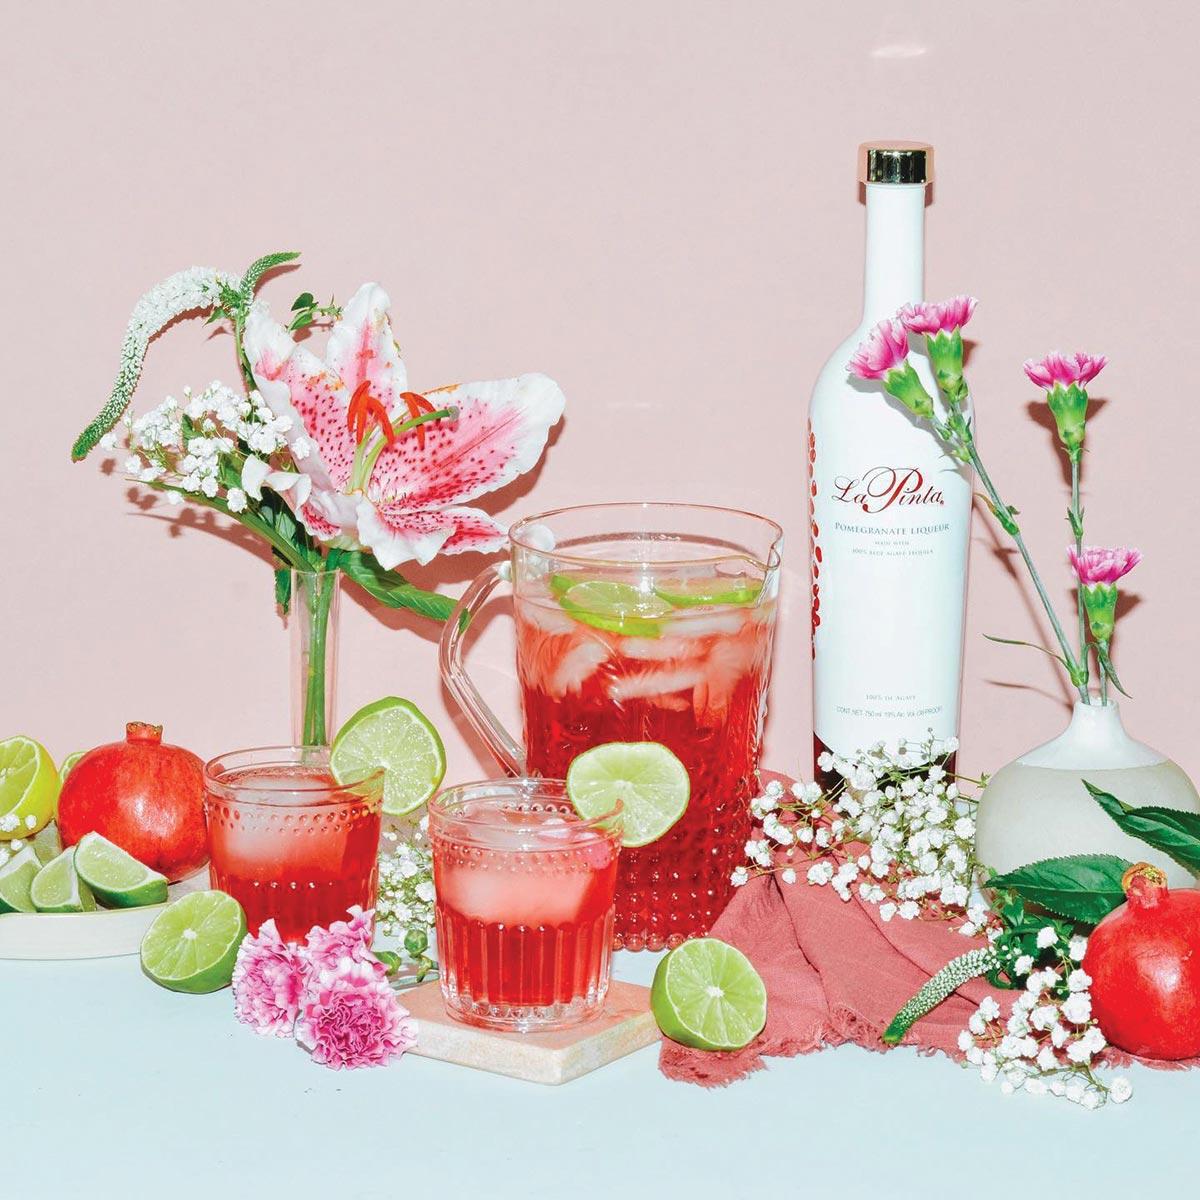 La Pinta Tequila Pomegranate Joins Slocum & Sons Portfolio